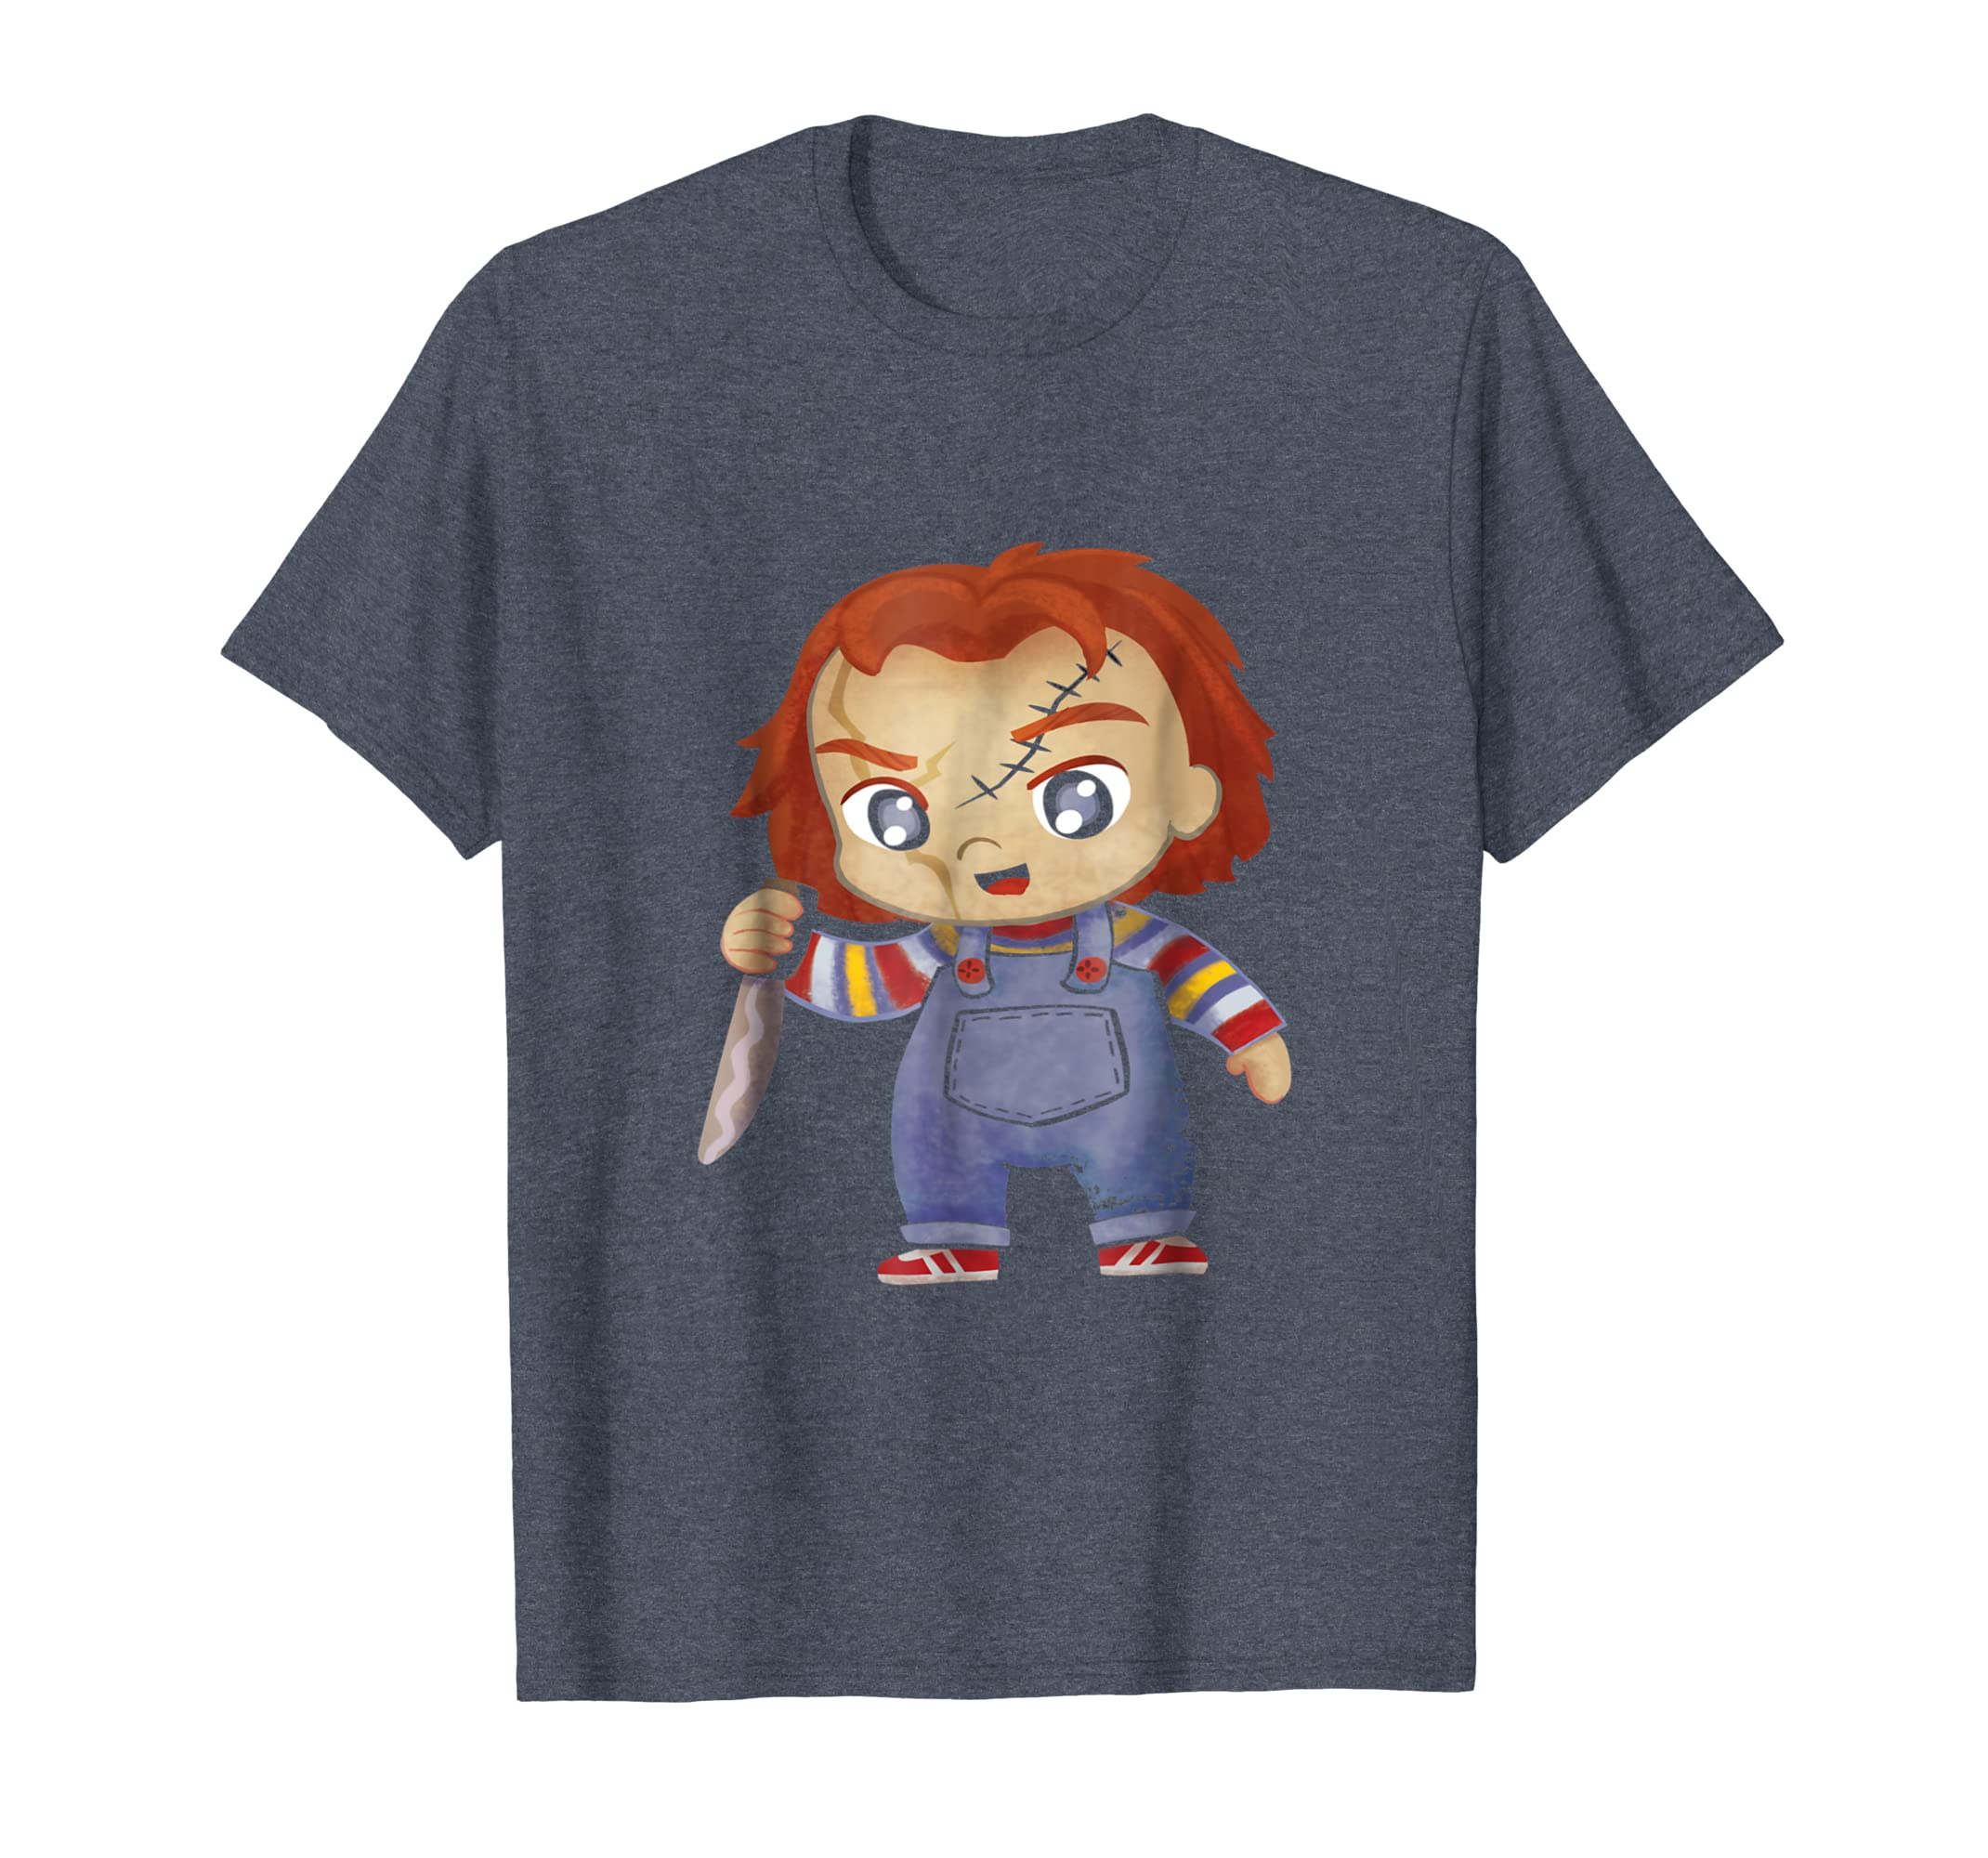 e71926e2 HC Chucky Childs Play Halloween costume t shirt-Rose – Rosetshirt